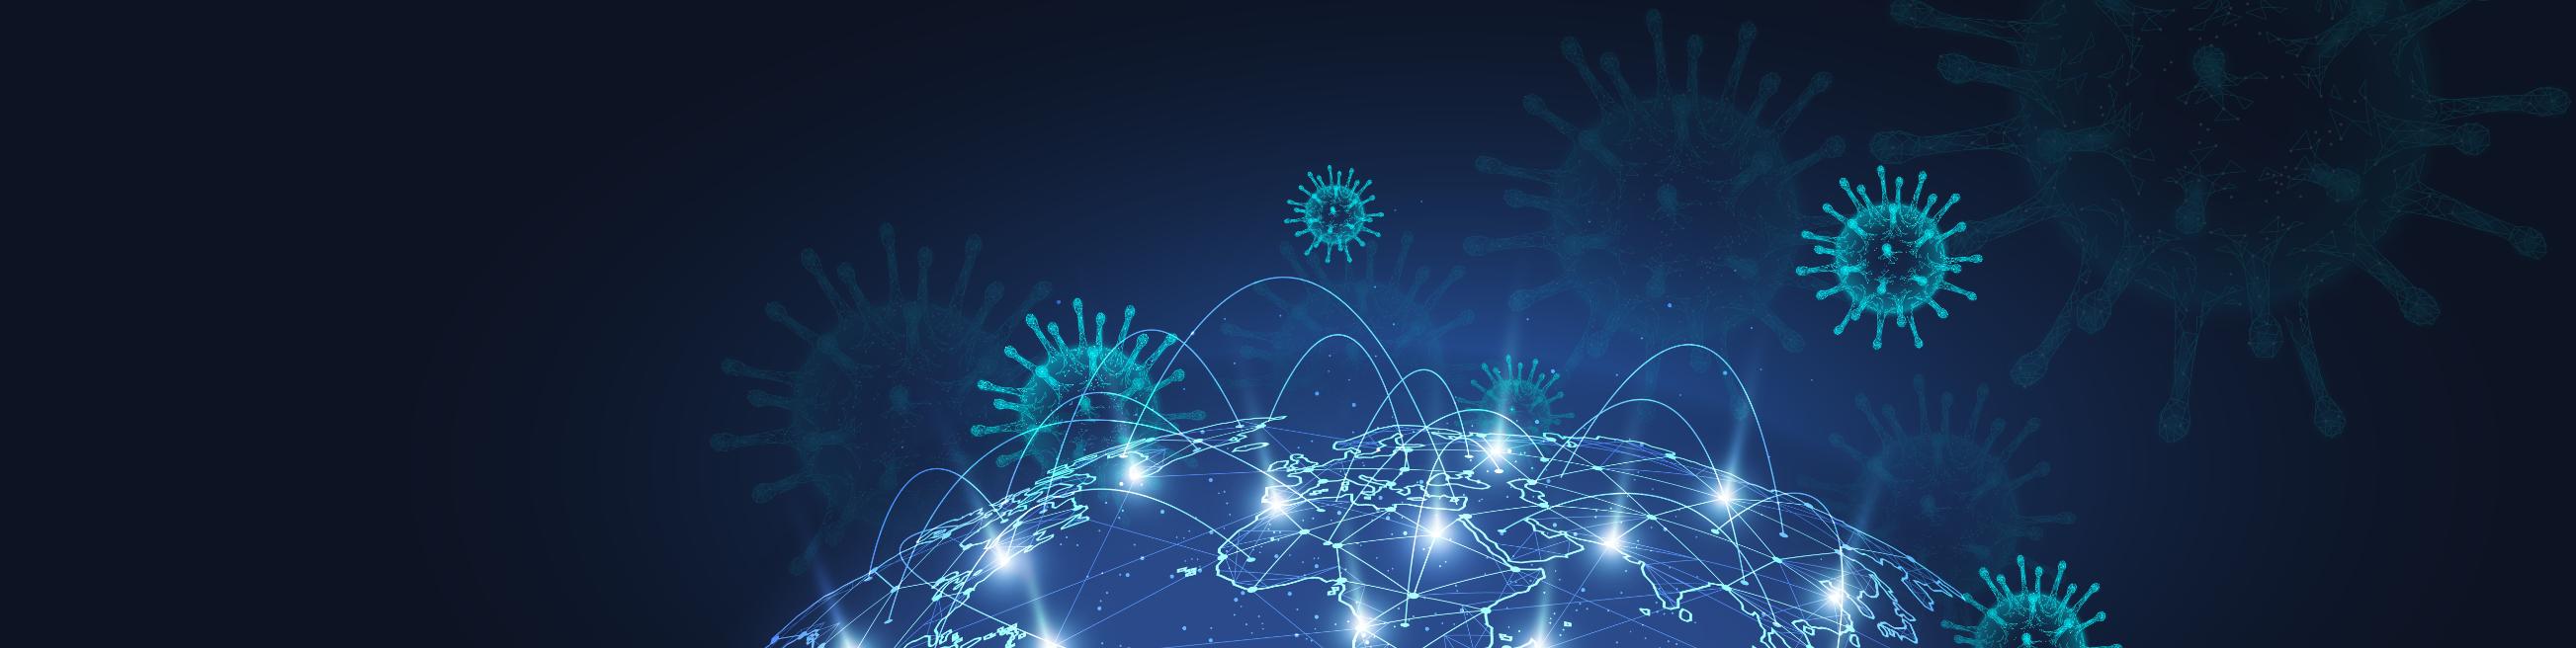 We help geo-dispersed customers streamline and simplify their IT operations